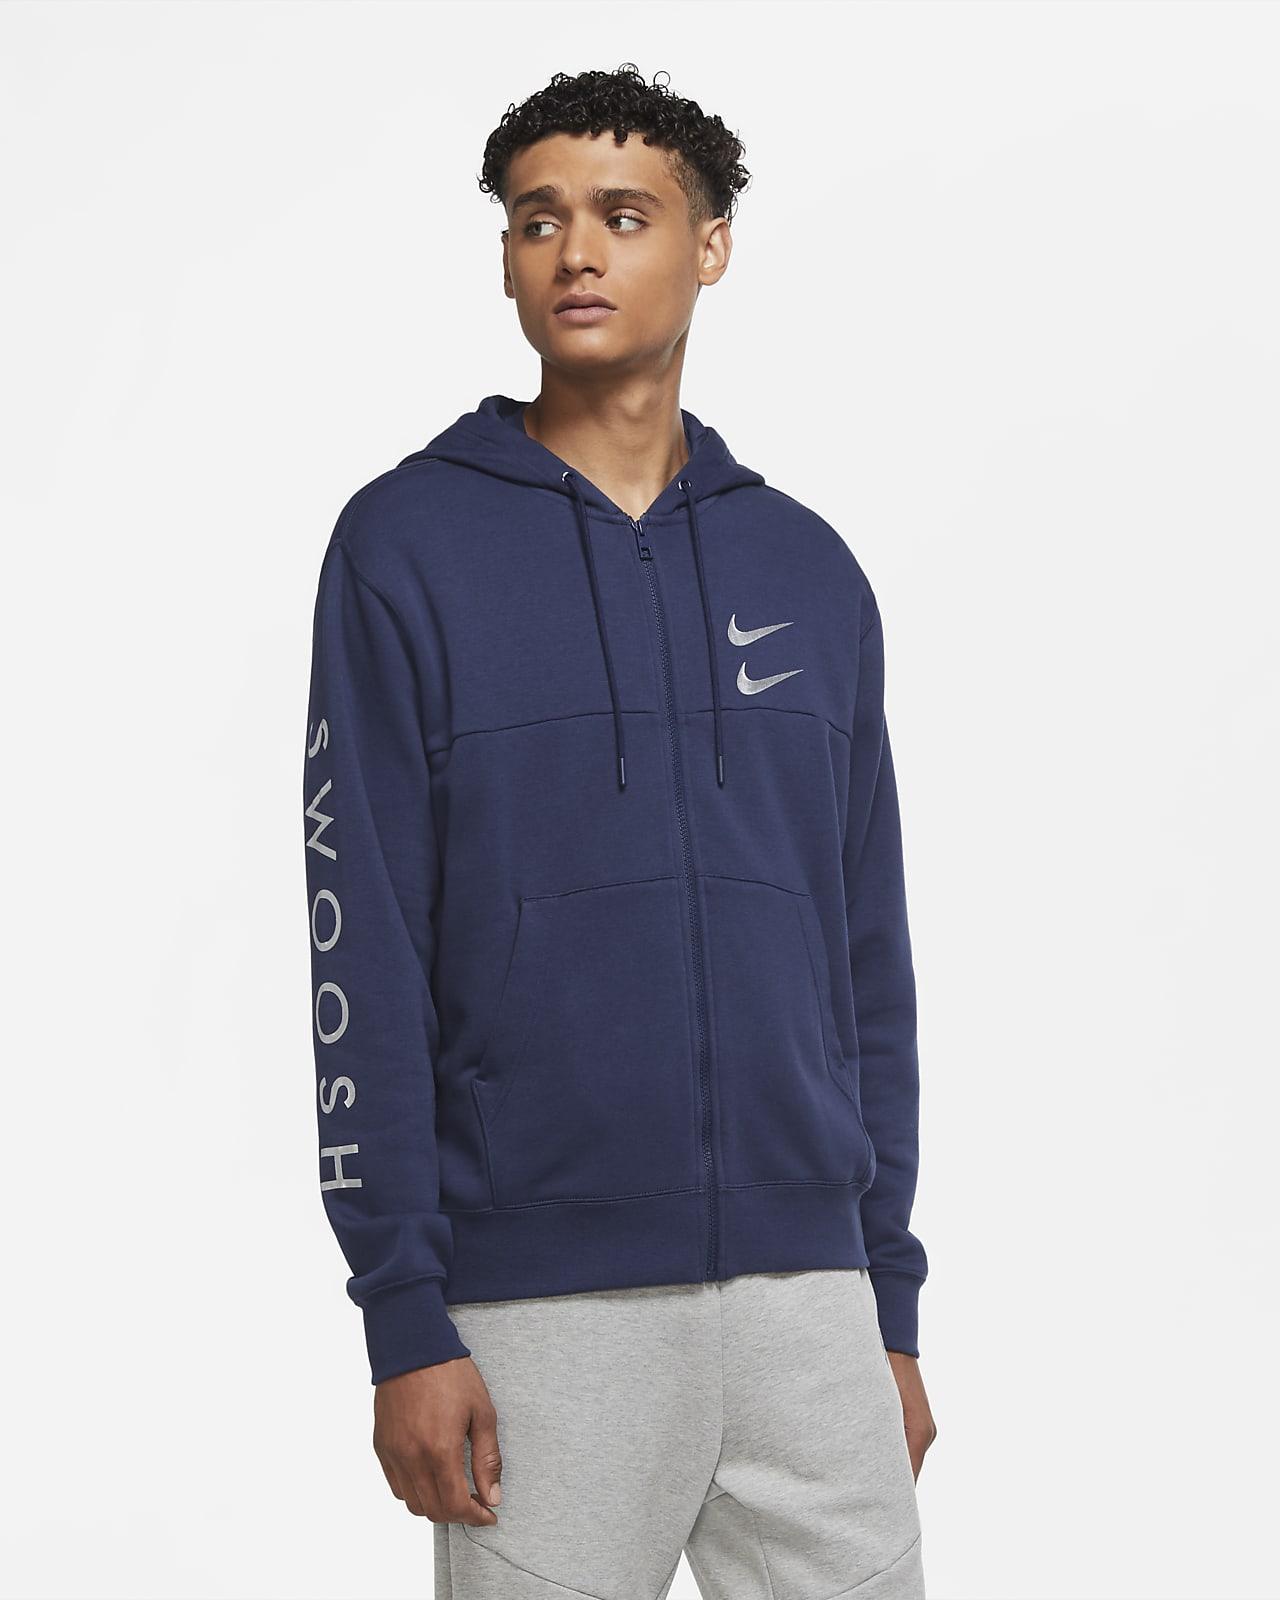 Nike Sportswear Swoosh Dessuadora amb caputxa i cremallera completa - Home